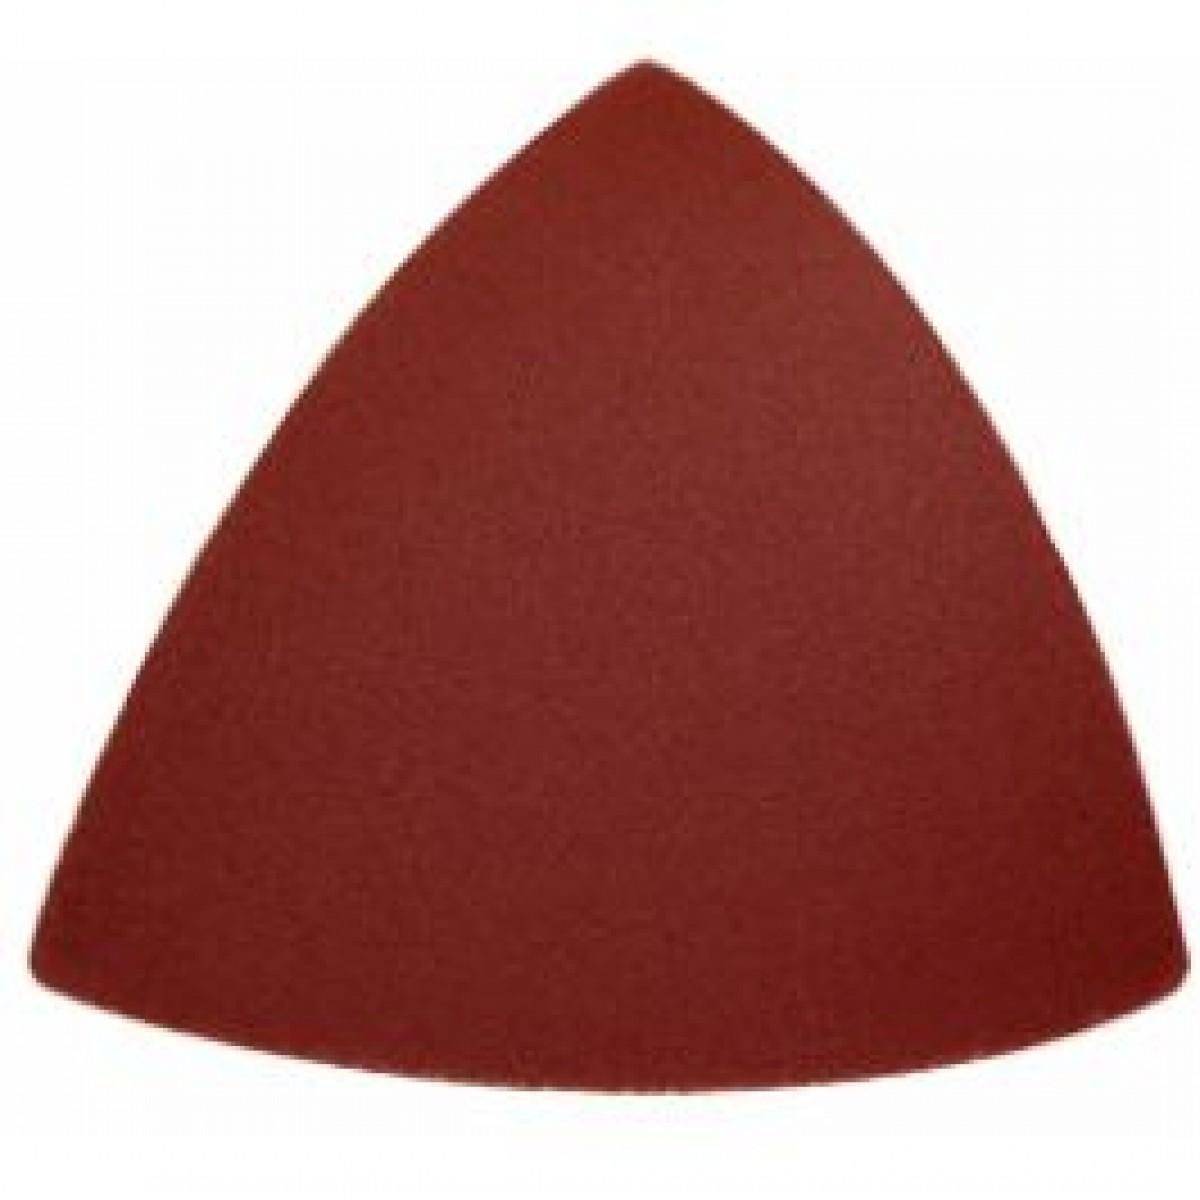 240 Grit Triangular Sanding Sheets 5 Pack